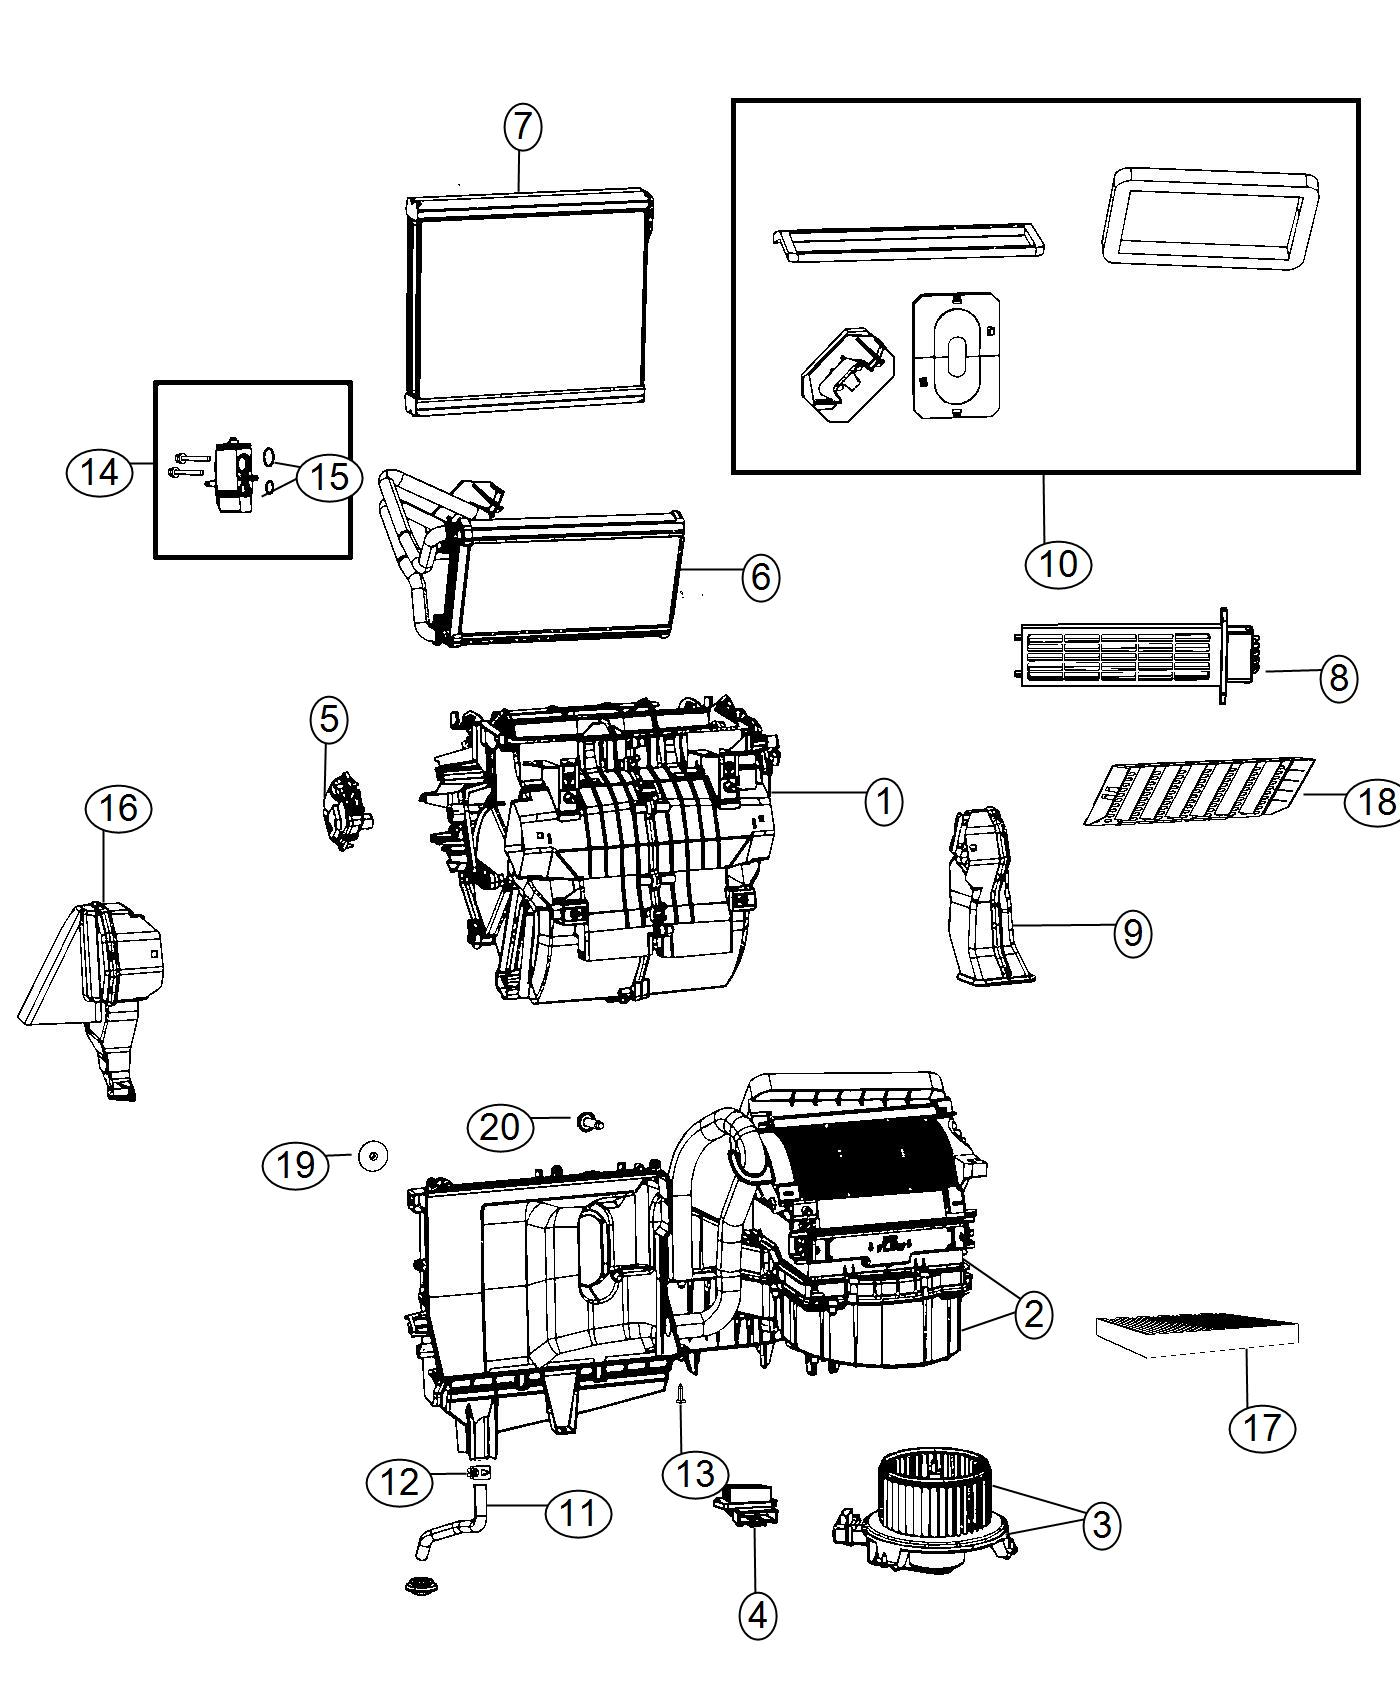 97 Dodge Ram Hvac Diagram